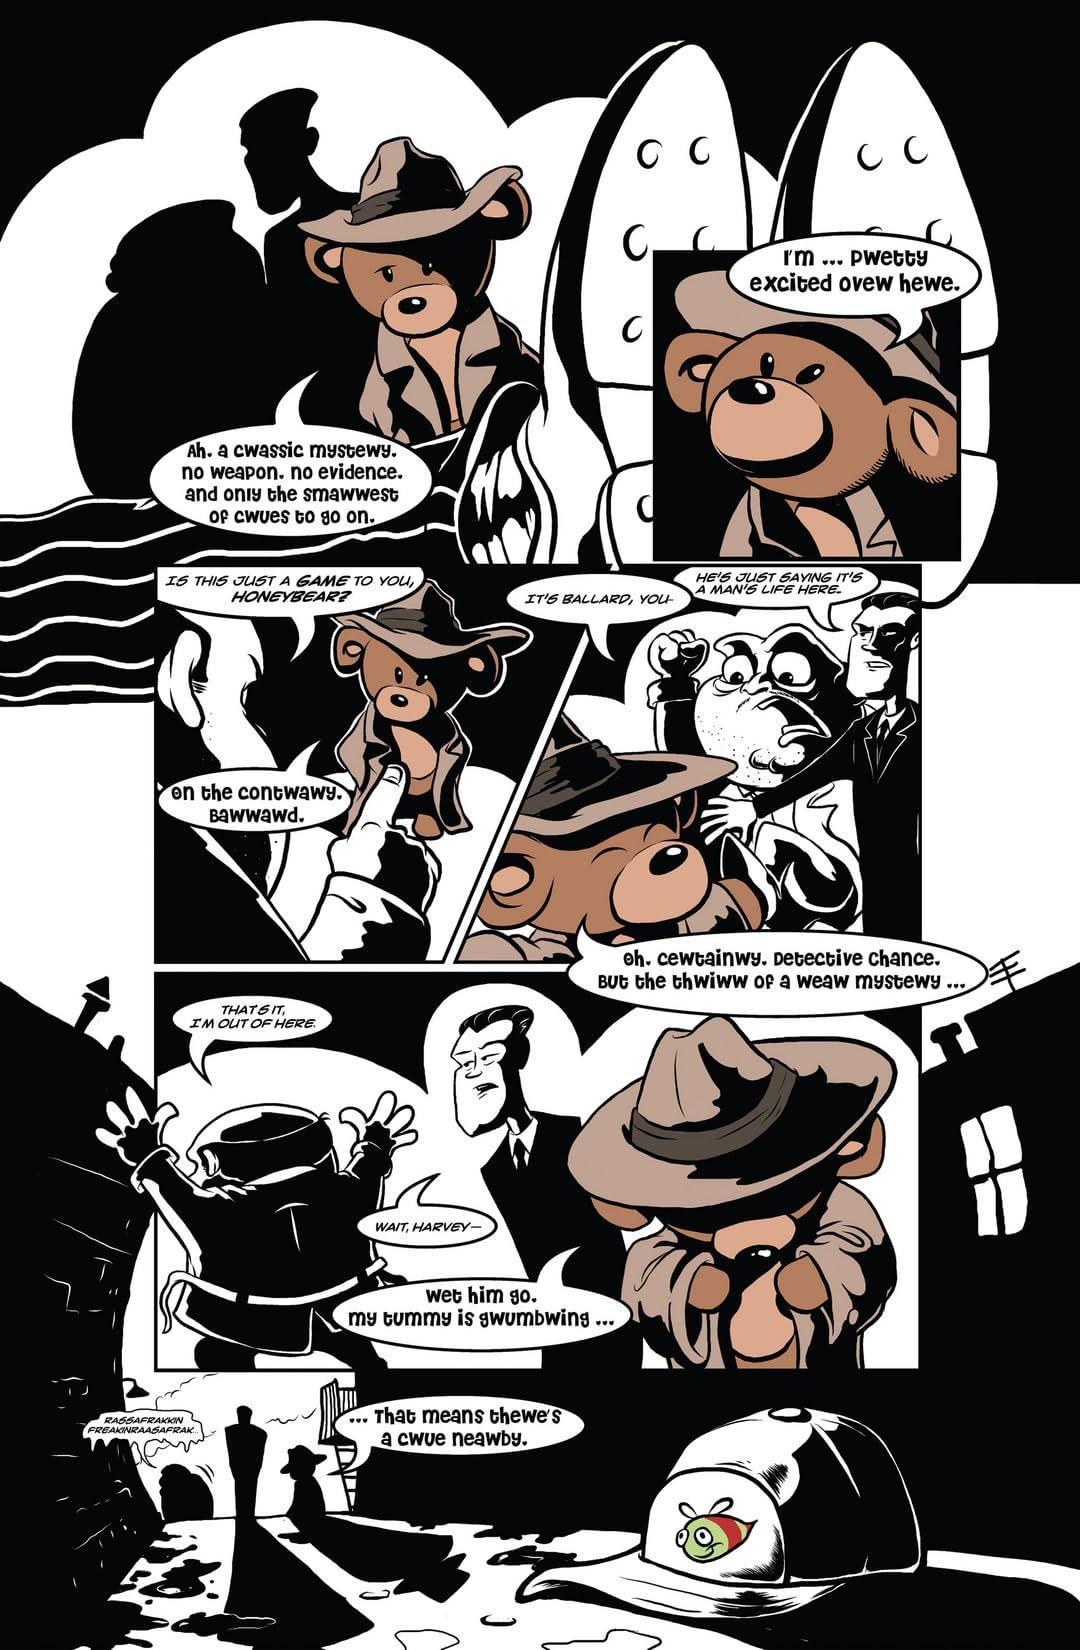 Detective Honeybear #1